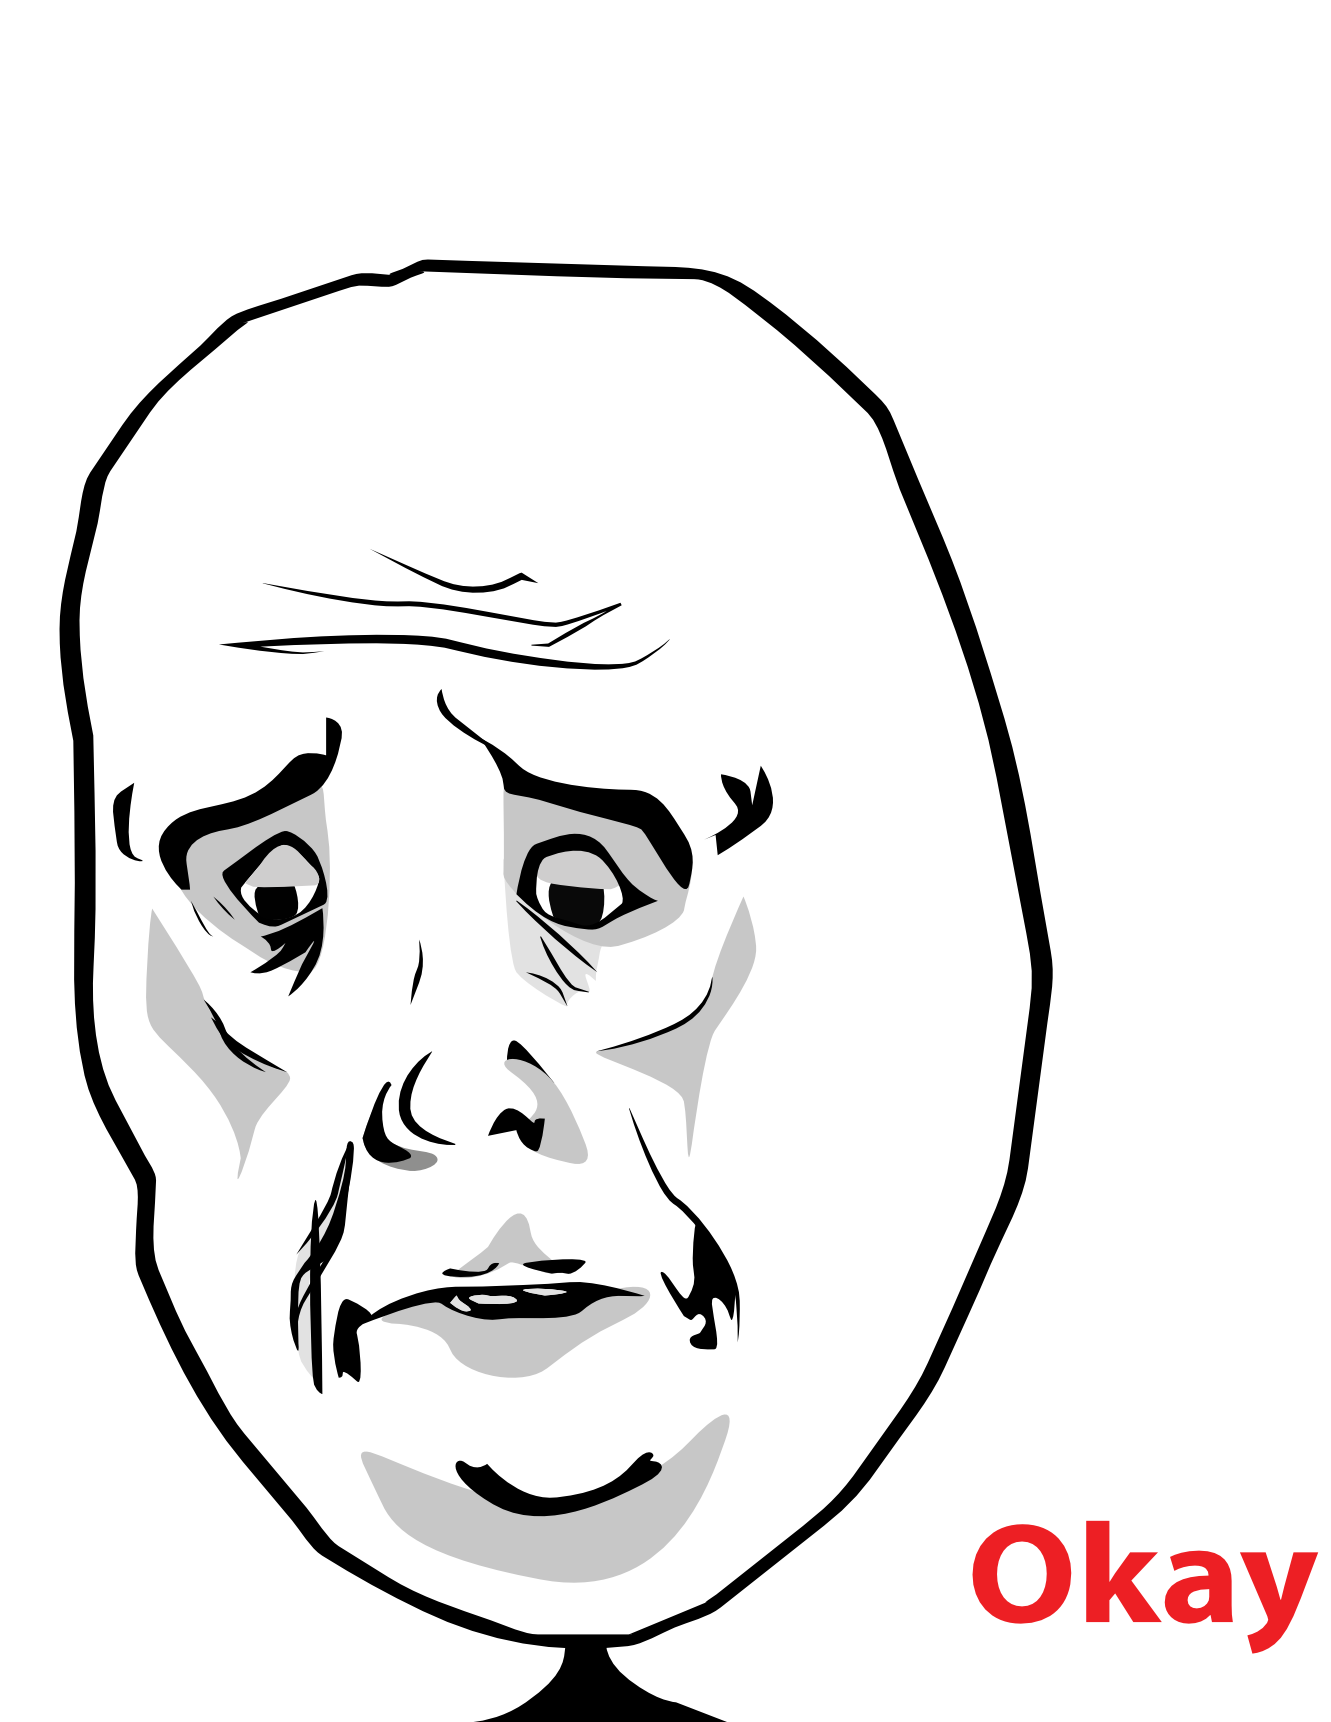 Funny Meme Face Png : Image famous characters troll face okay meme